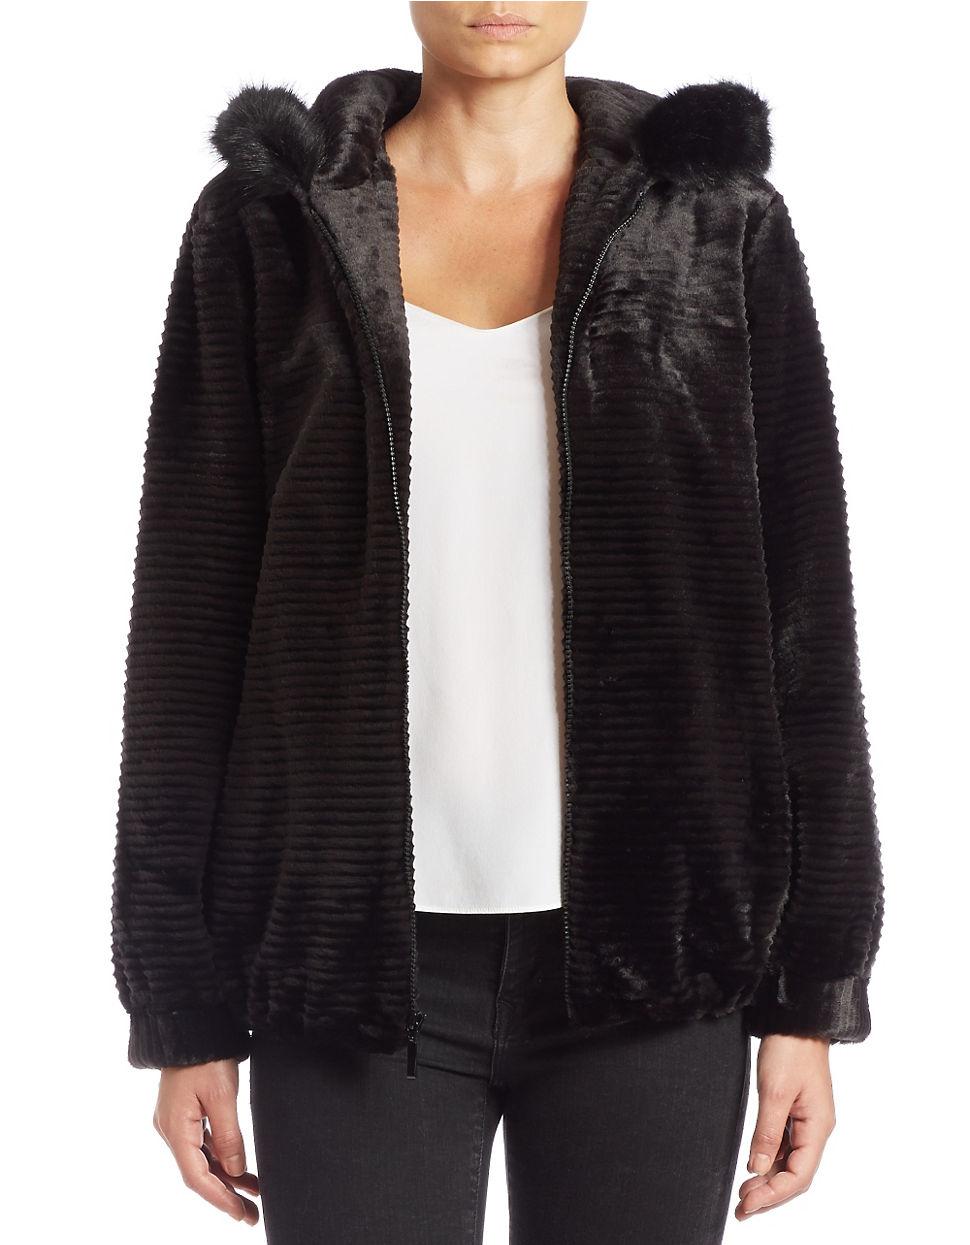 Gallery Hooded Faux Fur Jacket In Black Lyst